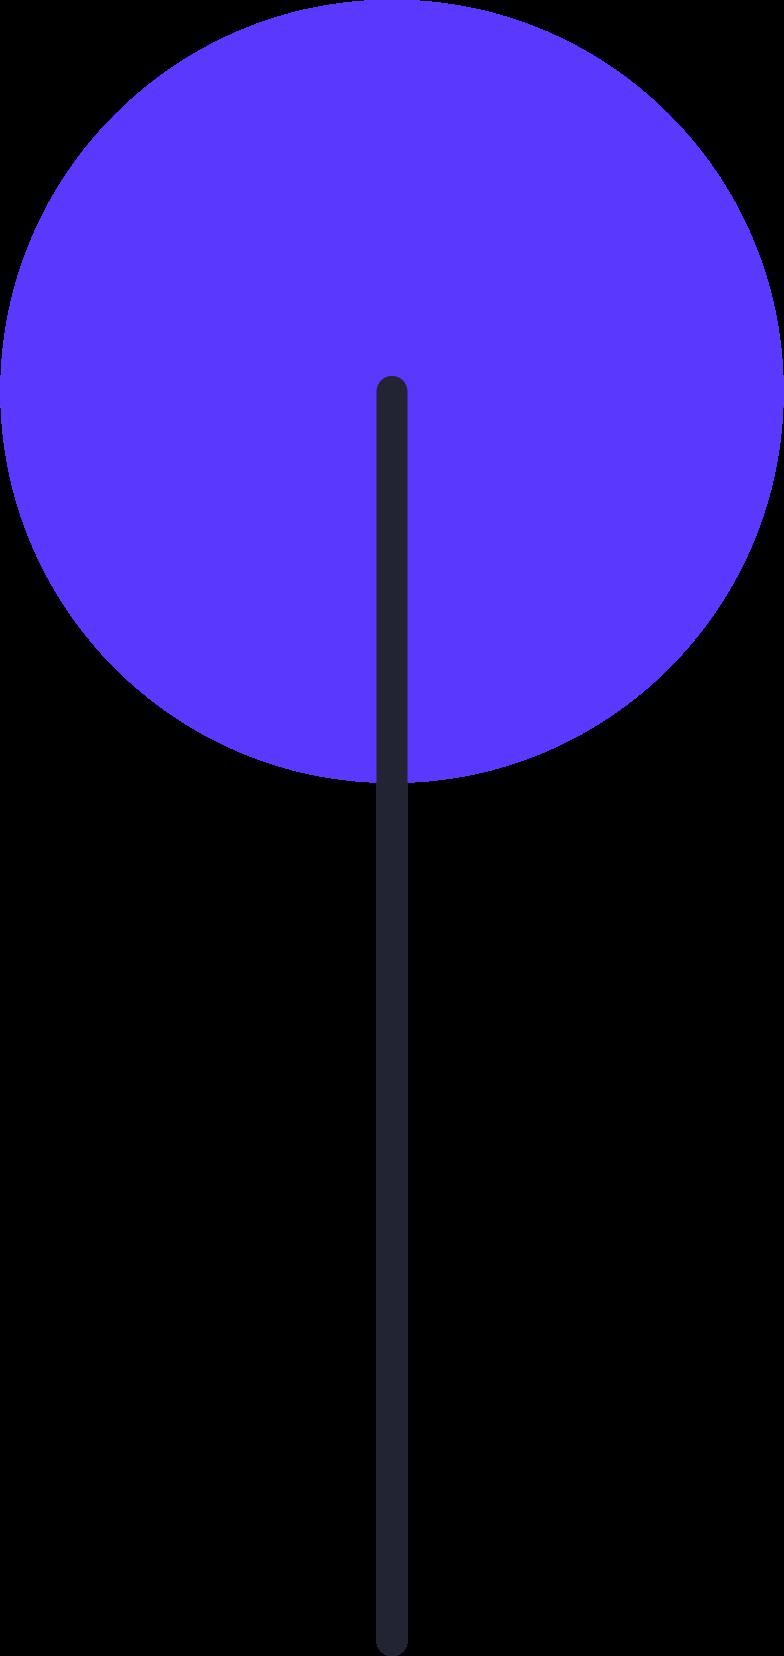 Ilustración de clipart de sign out  tree en PNG, SVG